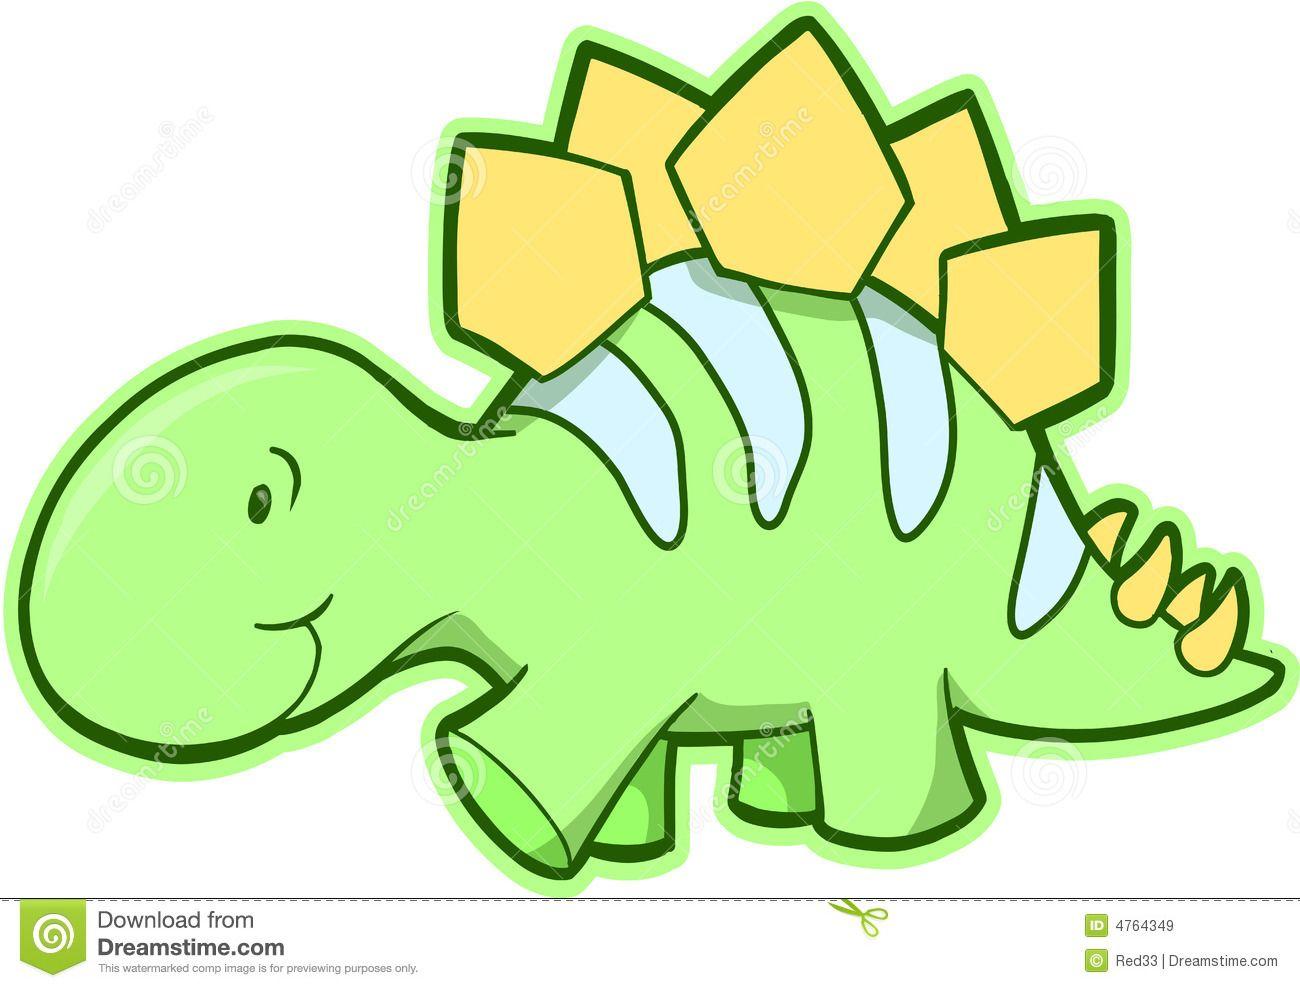 medium resolution of dinossauro cute pesquisa google royalty free photos cute dinosaur free stock image